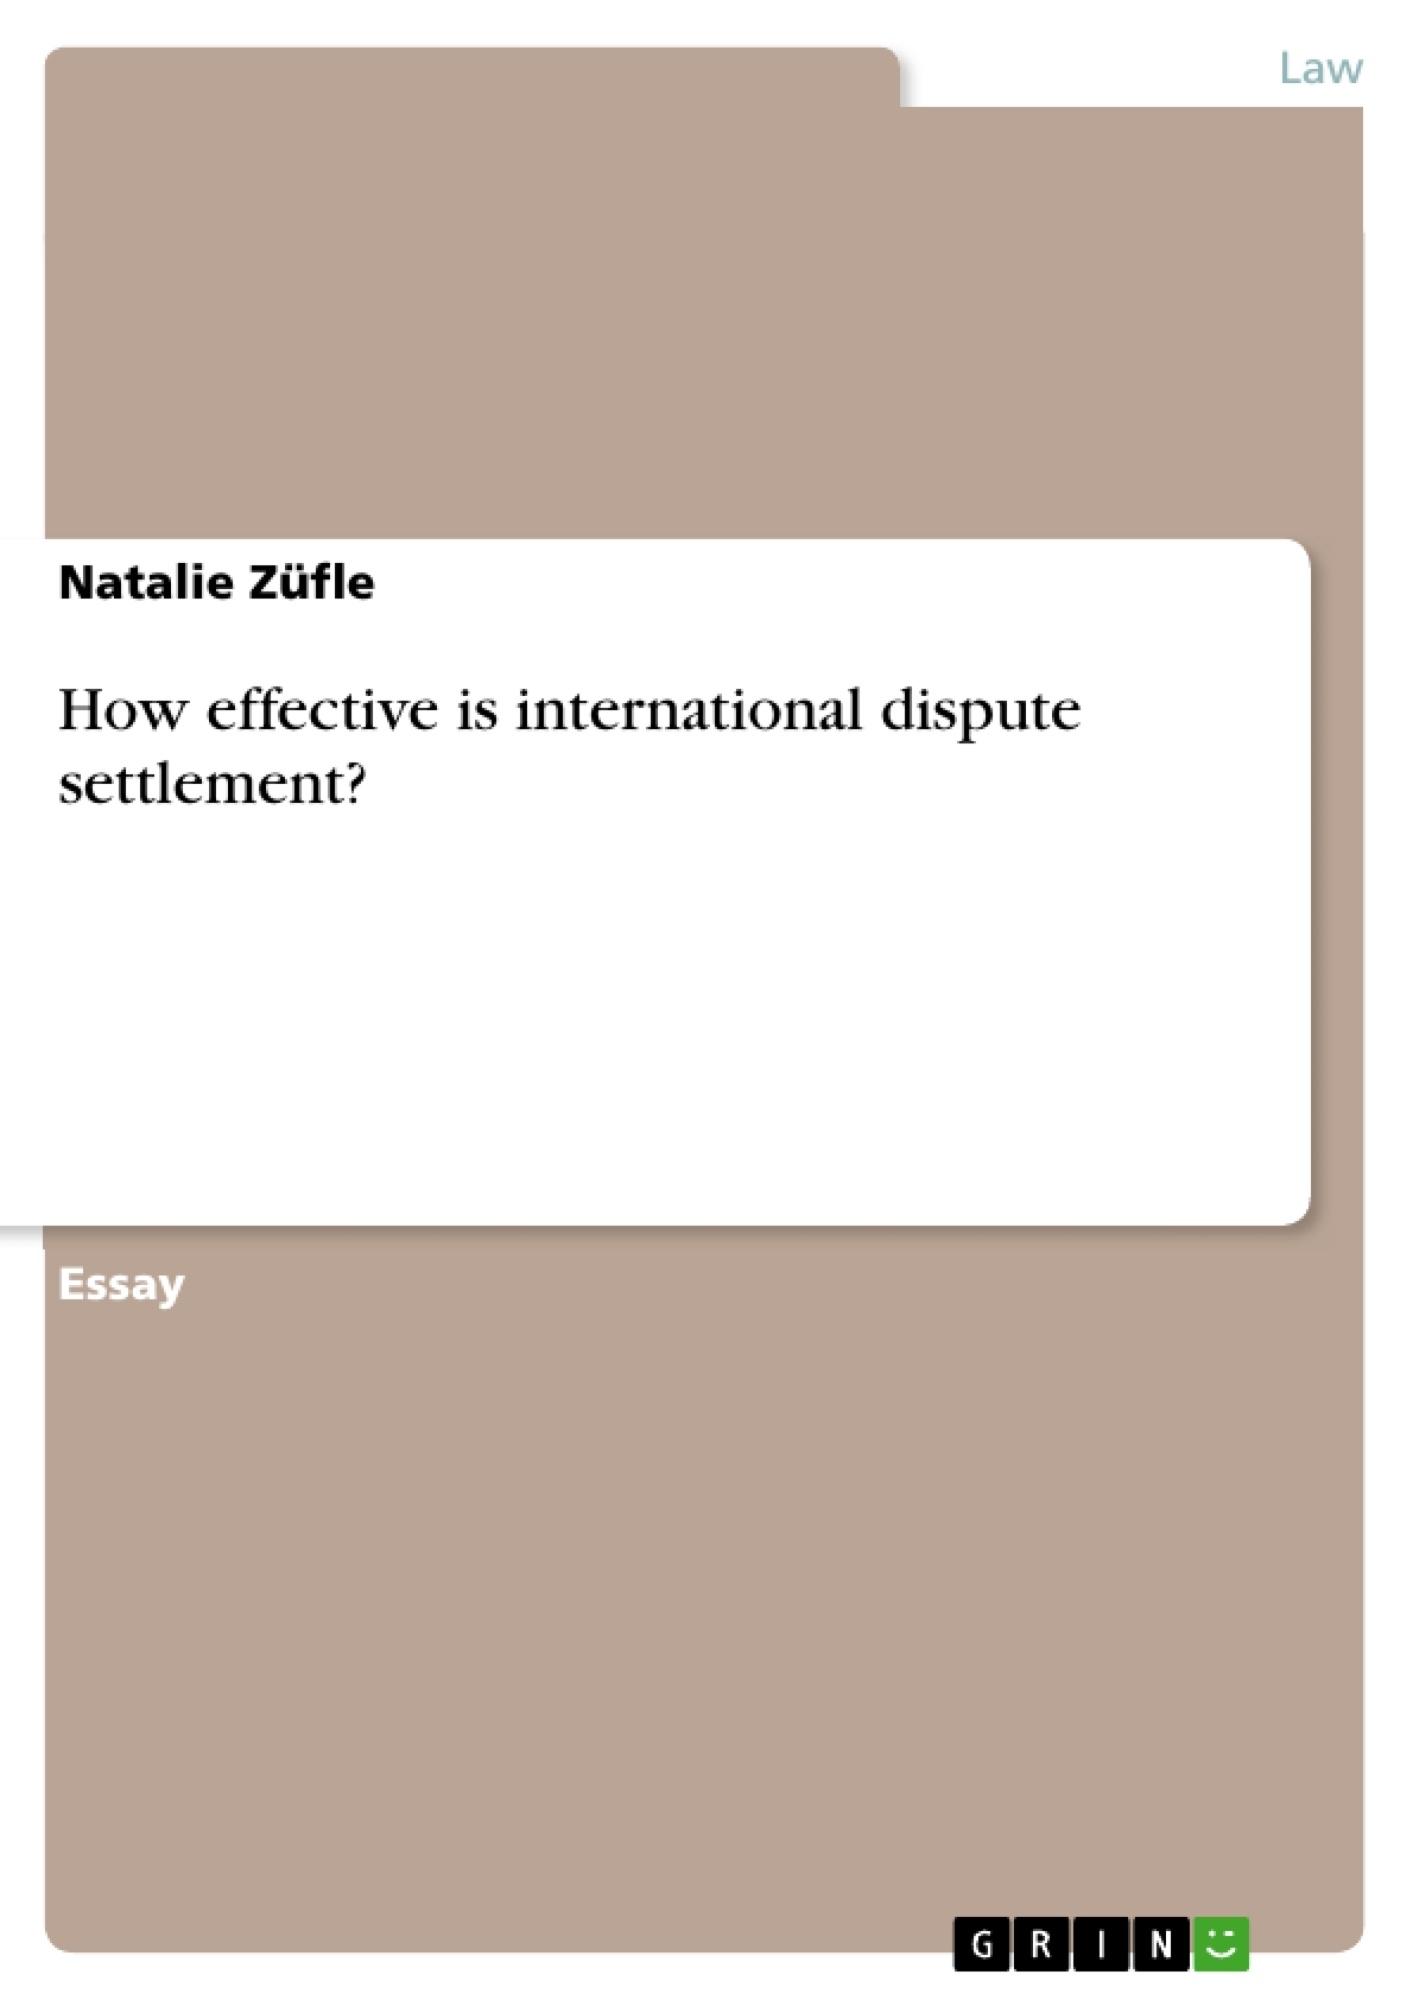 Title: How effective is international dispute settlement?